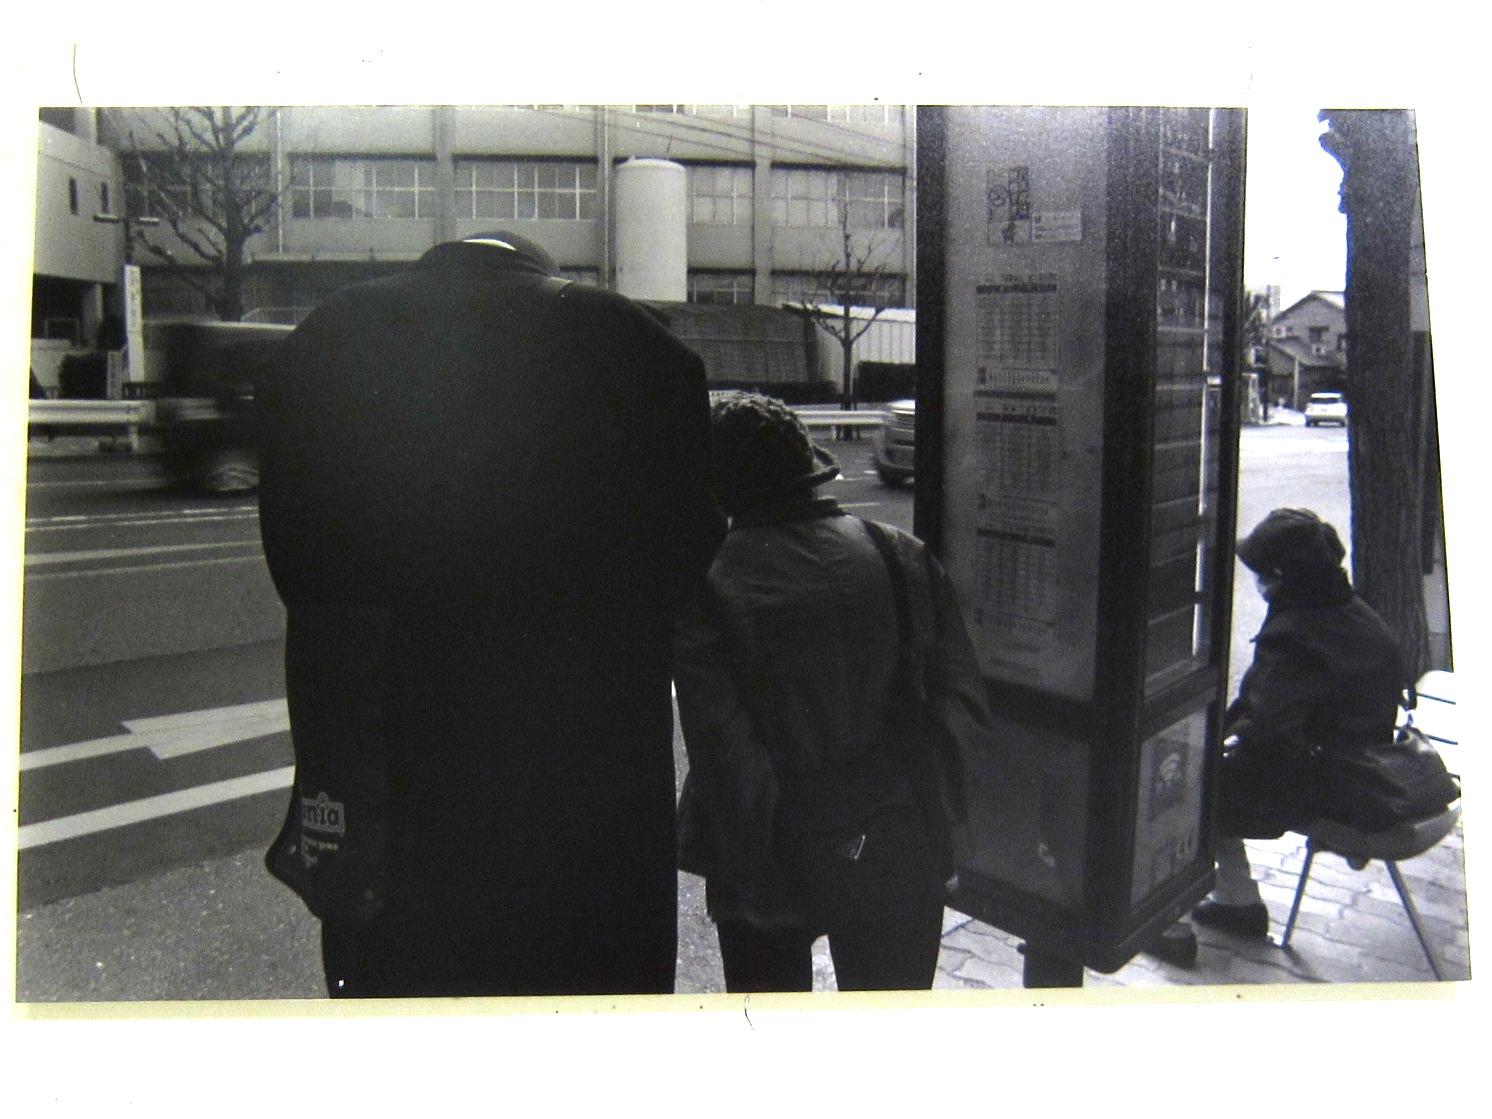 2375)「藤女子大学写真部写真展 三月展」 アイボリー 終了/3月11日(火)~3月16日(日)   _f0126829_2150784.jpg